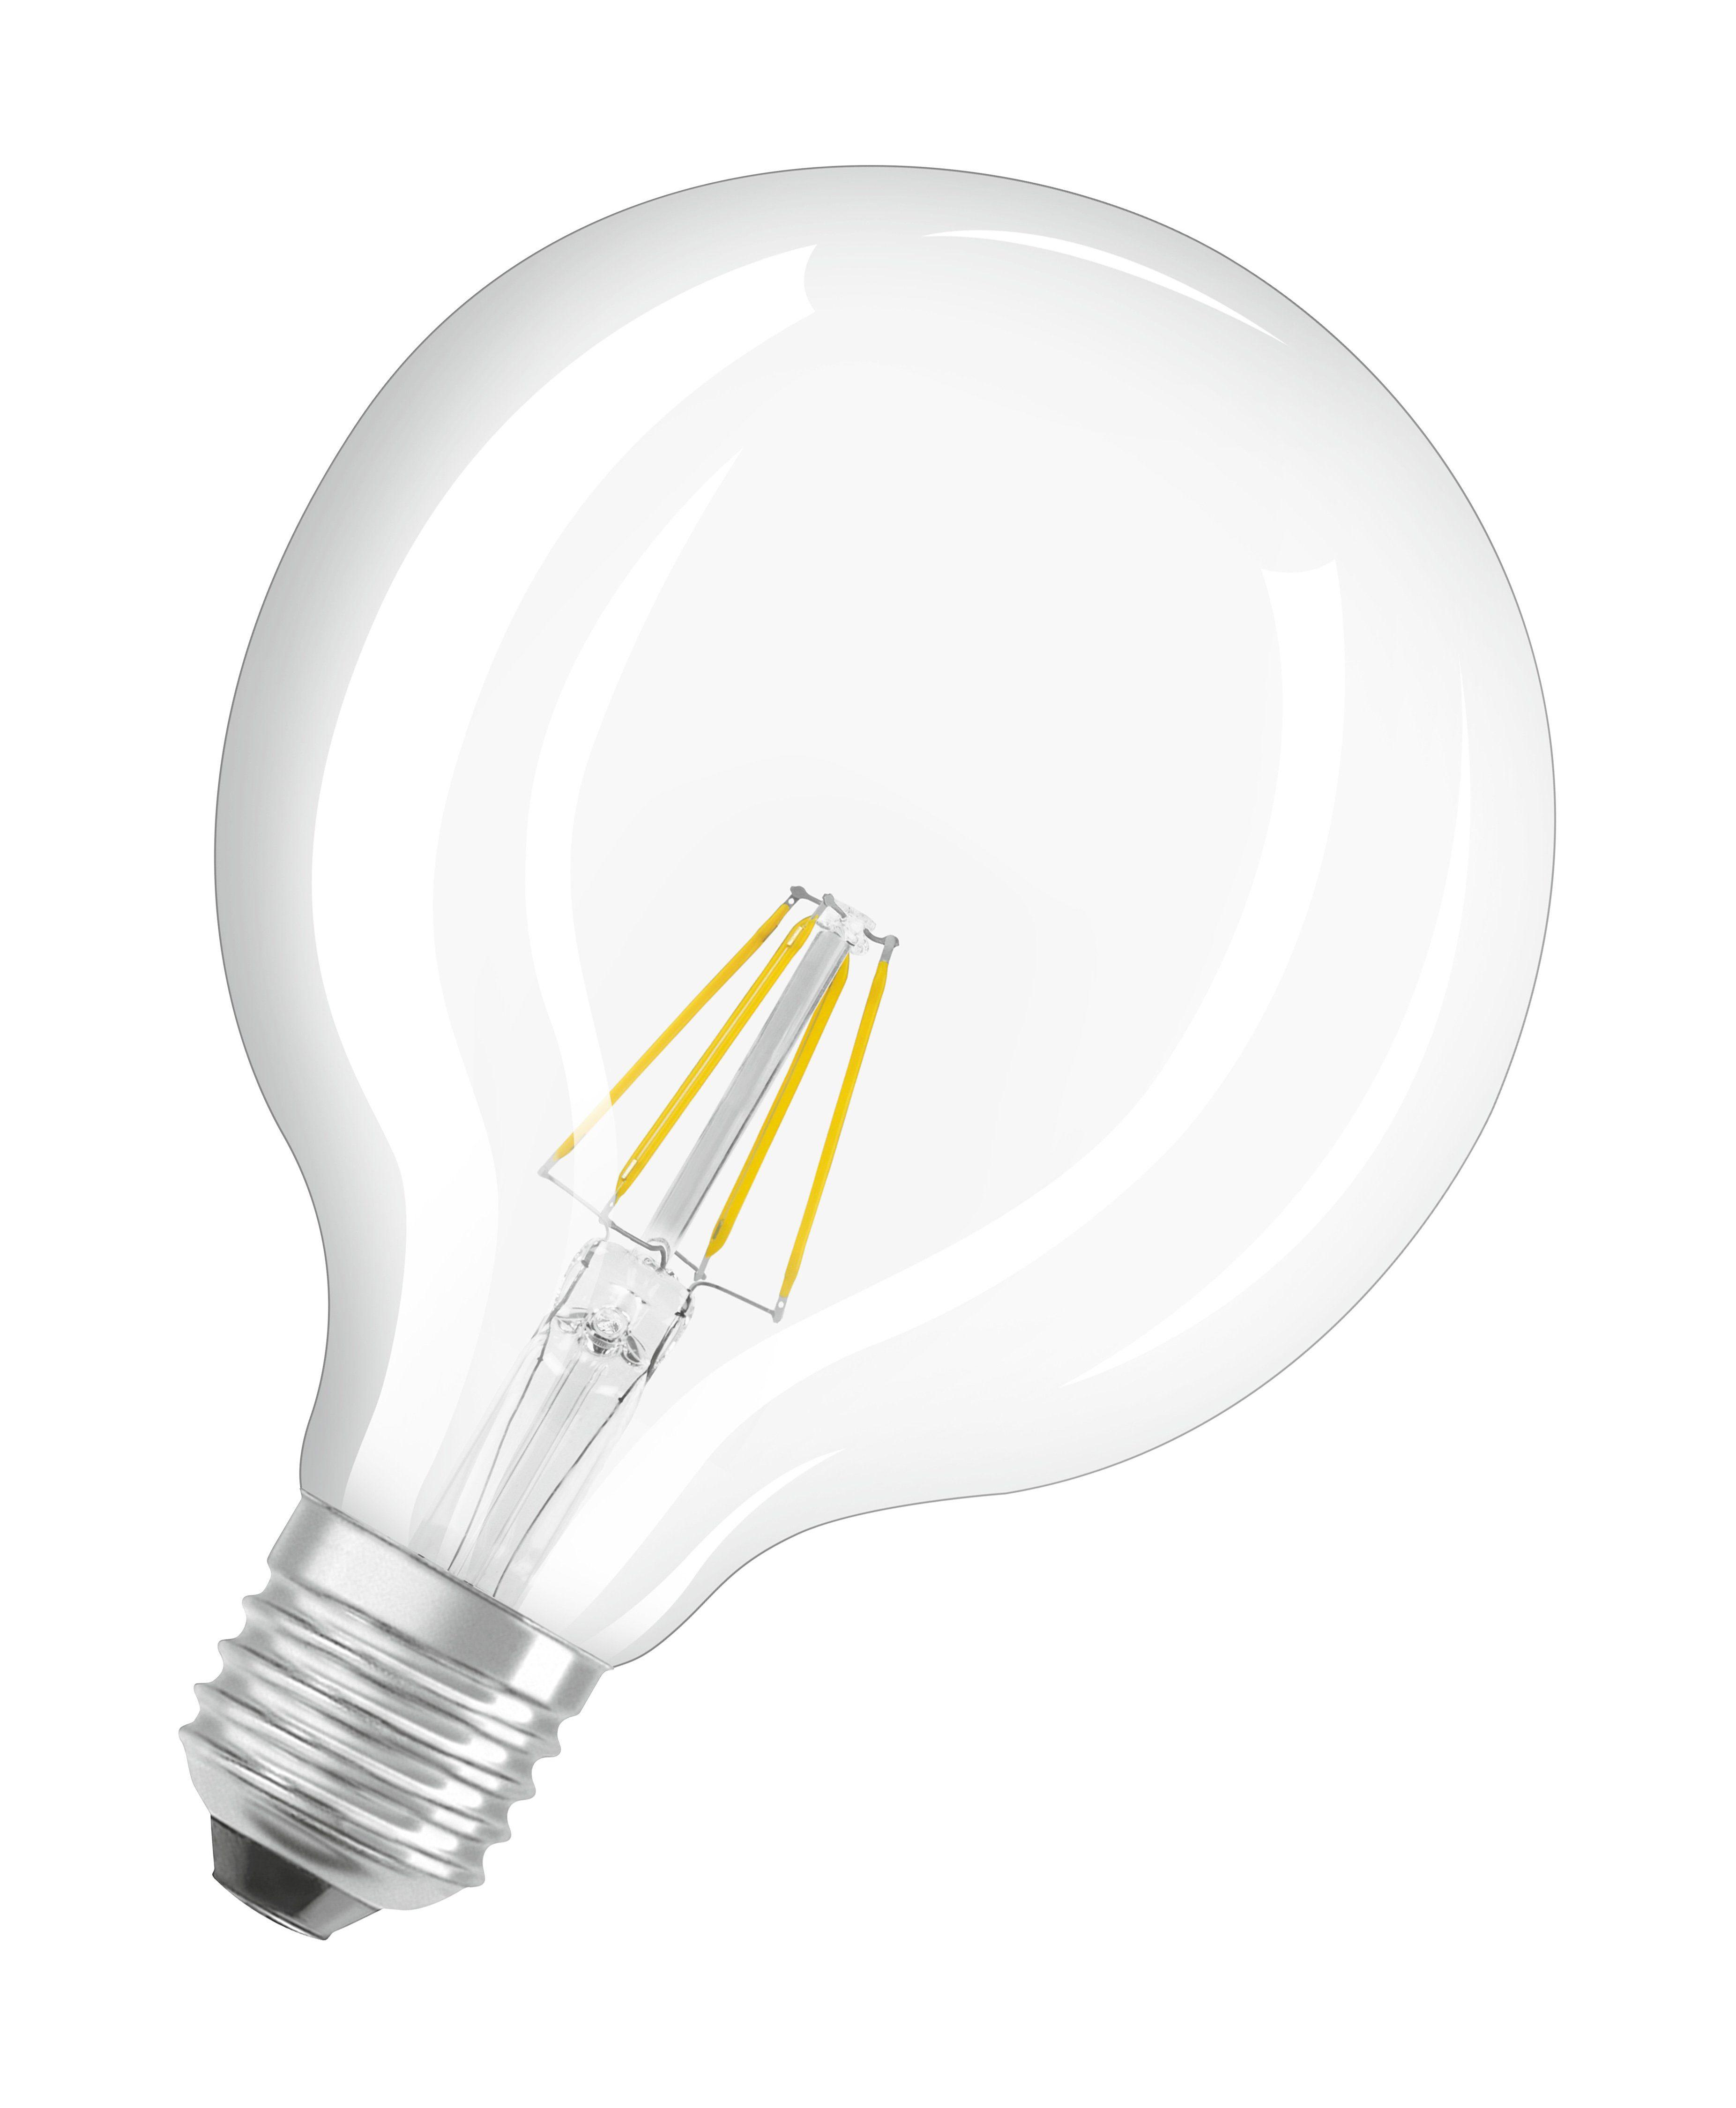 Osram LED Retrofit CLASSIC GLOBE - LED-Lampe, klassische Ballform »RF GLOBE 60 6 W/827 E27«